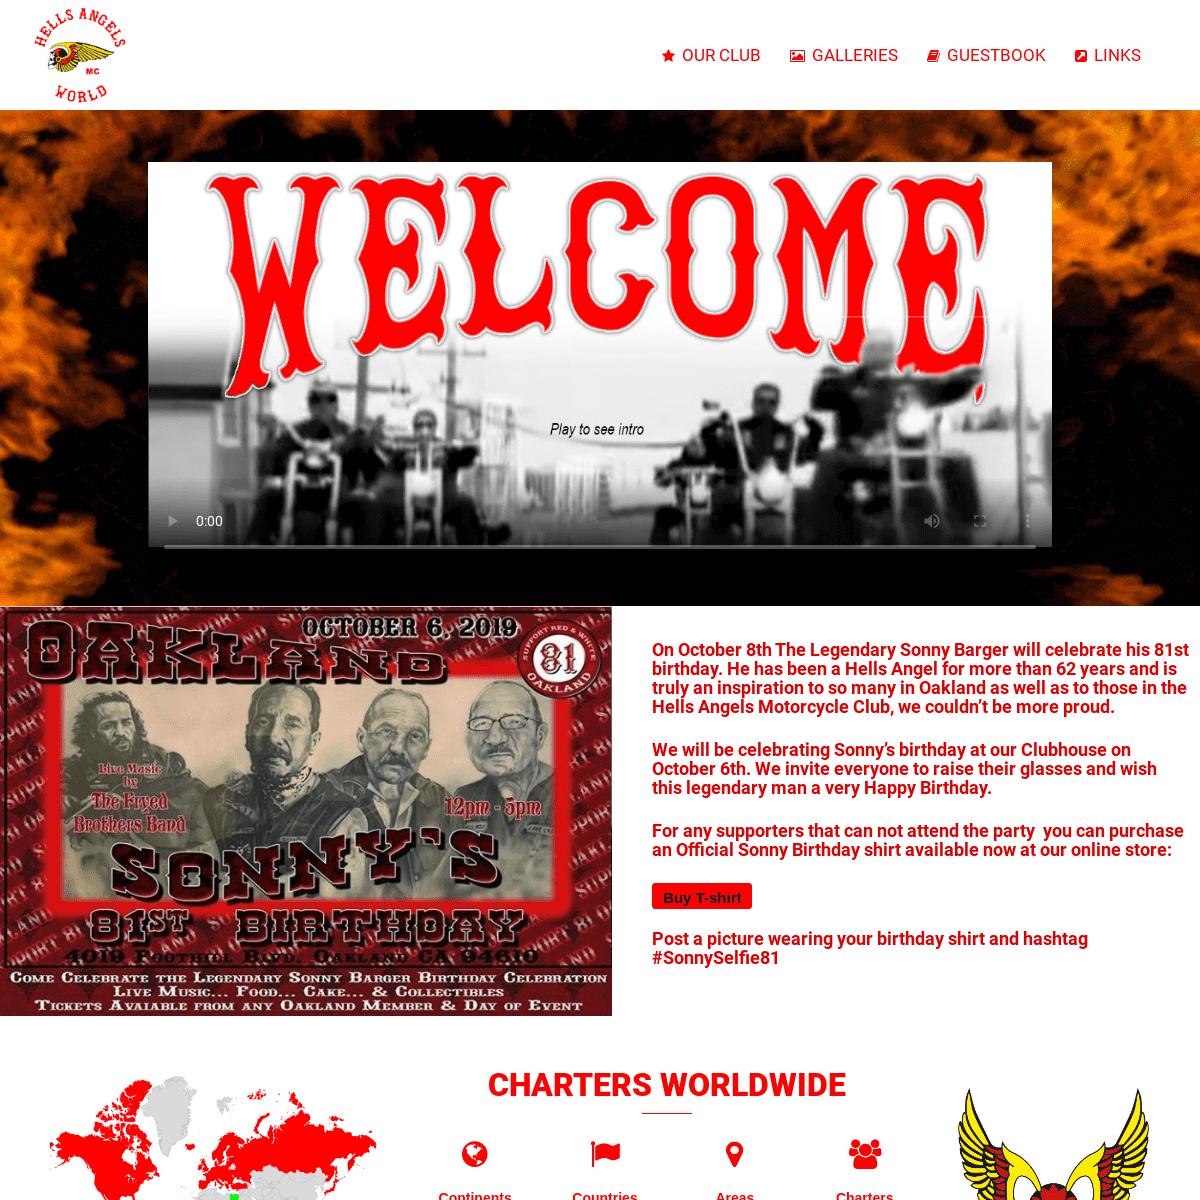 Hells Angels MC World